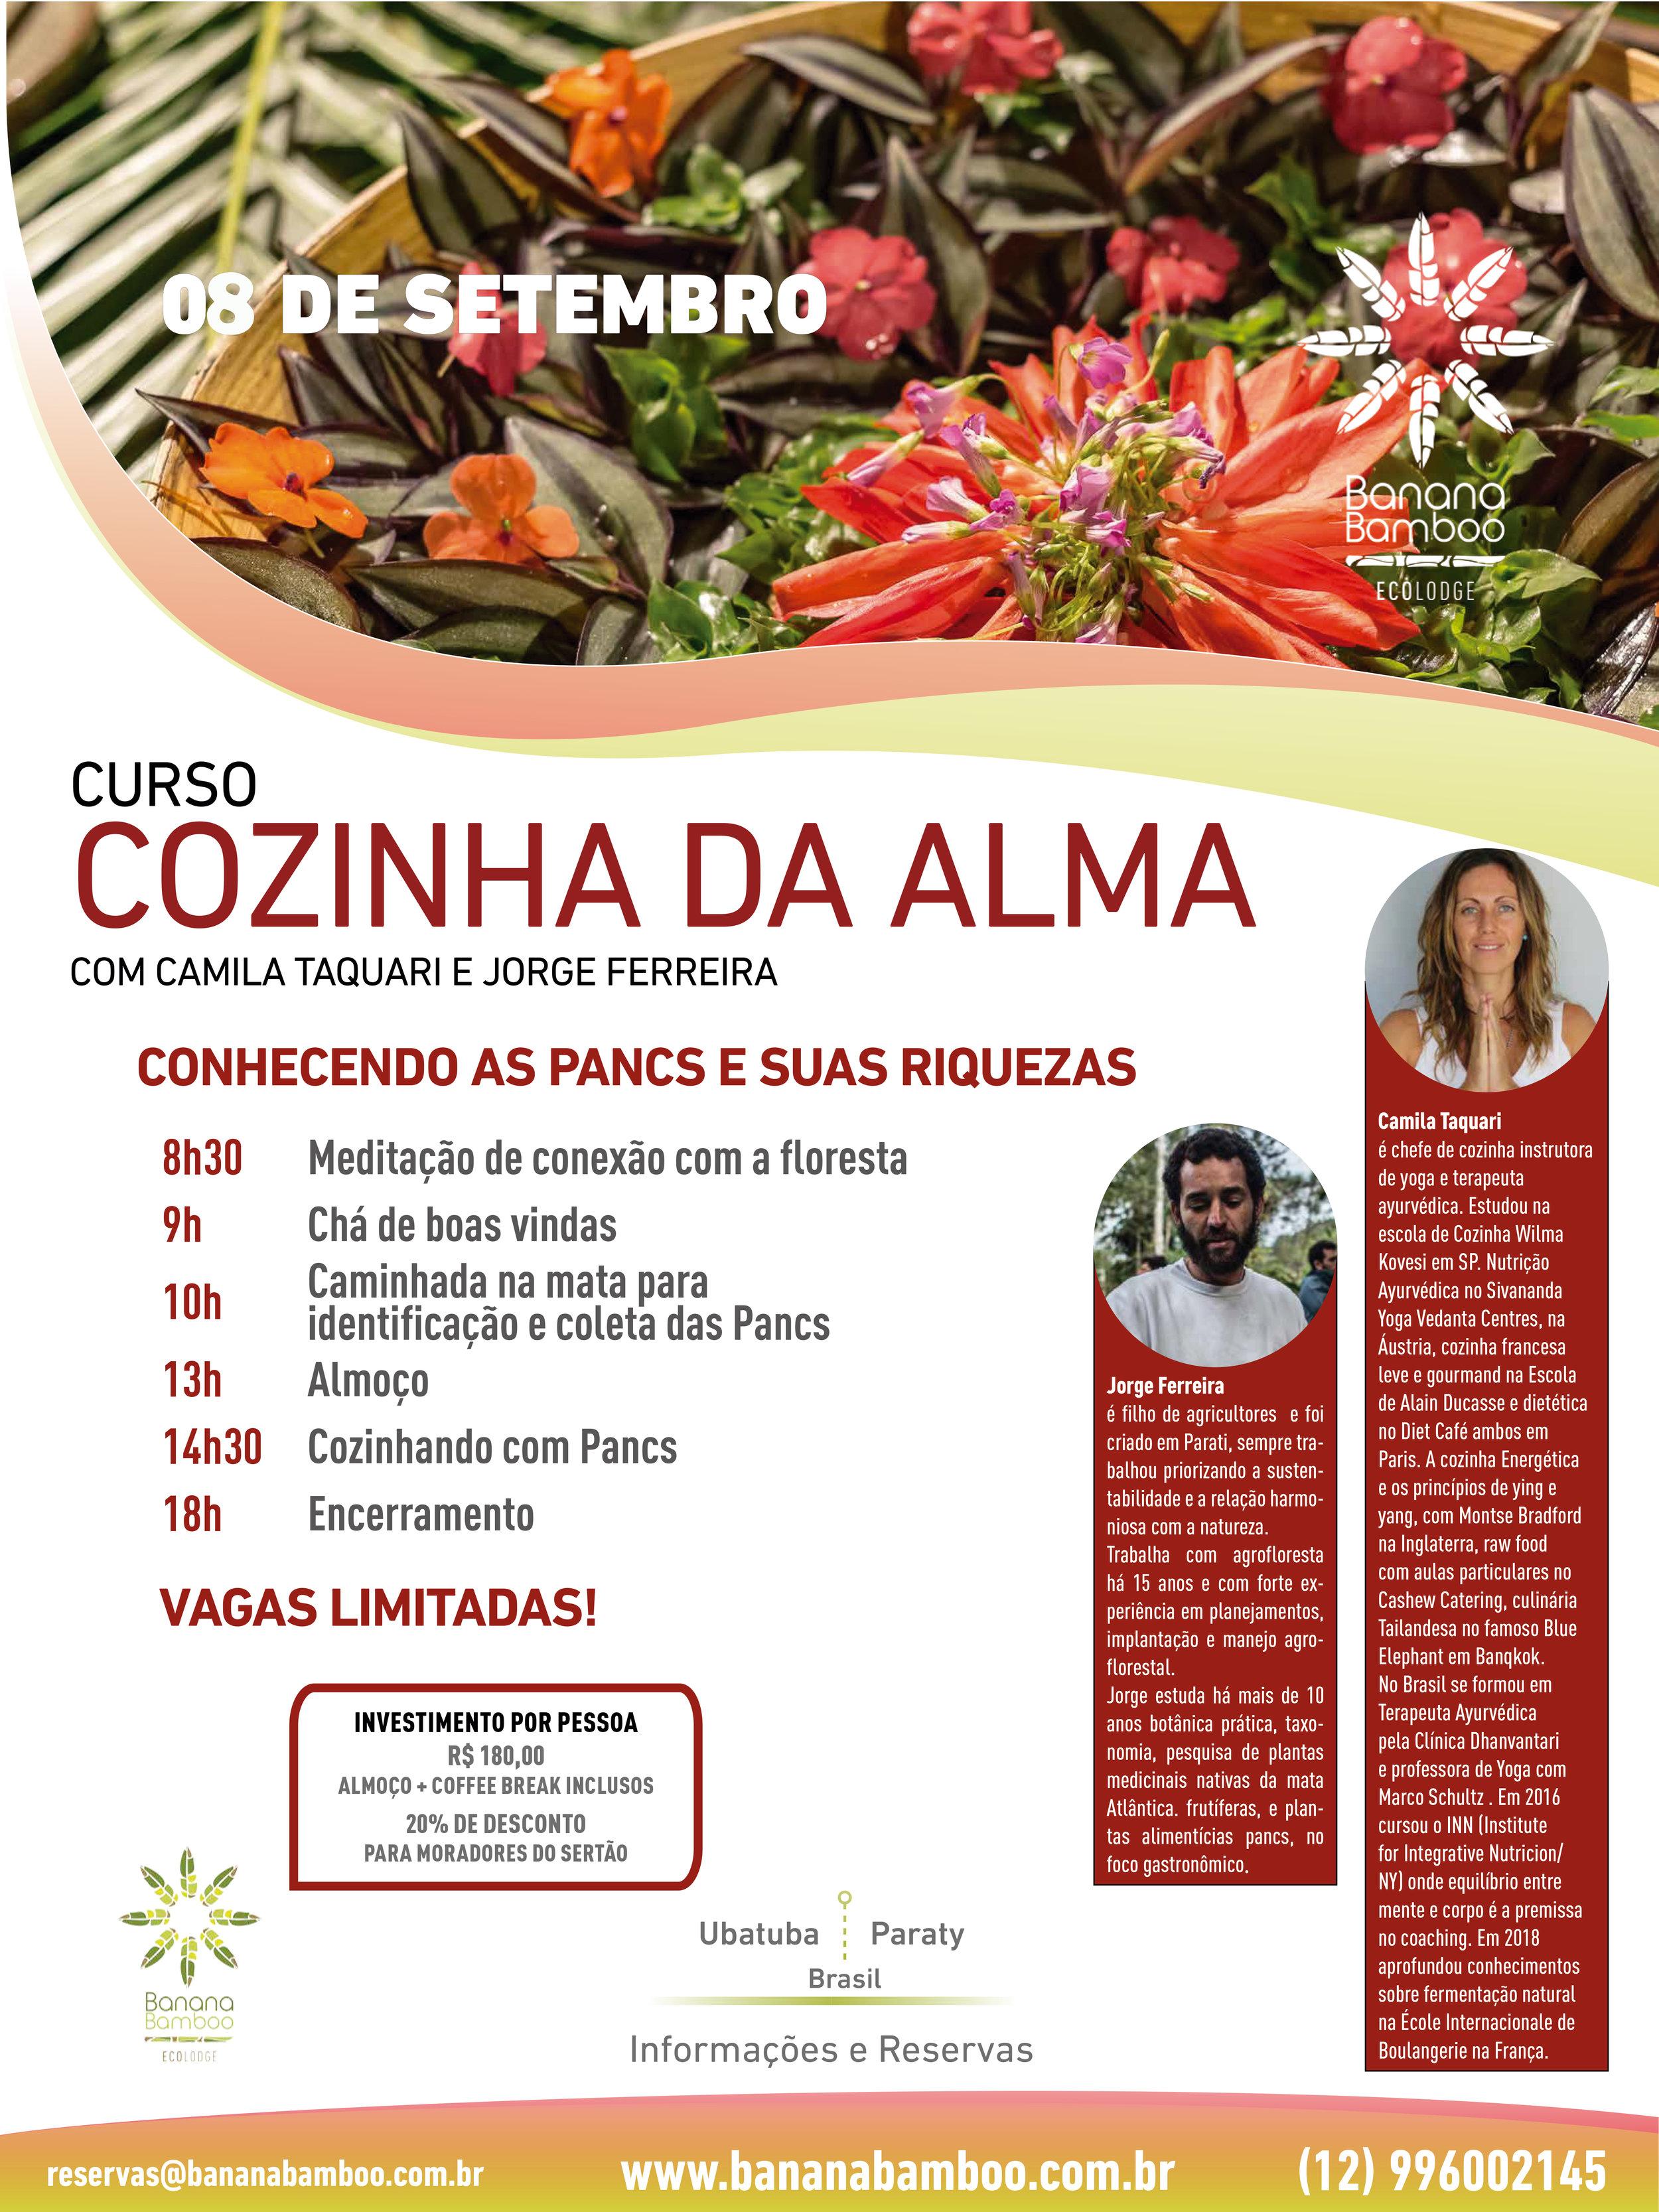 COZINHA DA ALMA_CARTAZ_O1.jpg